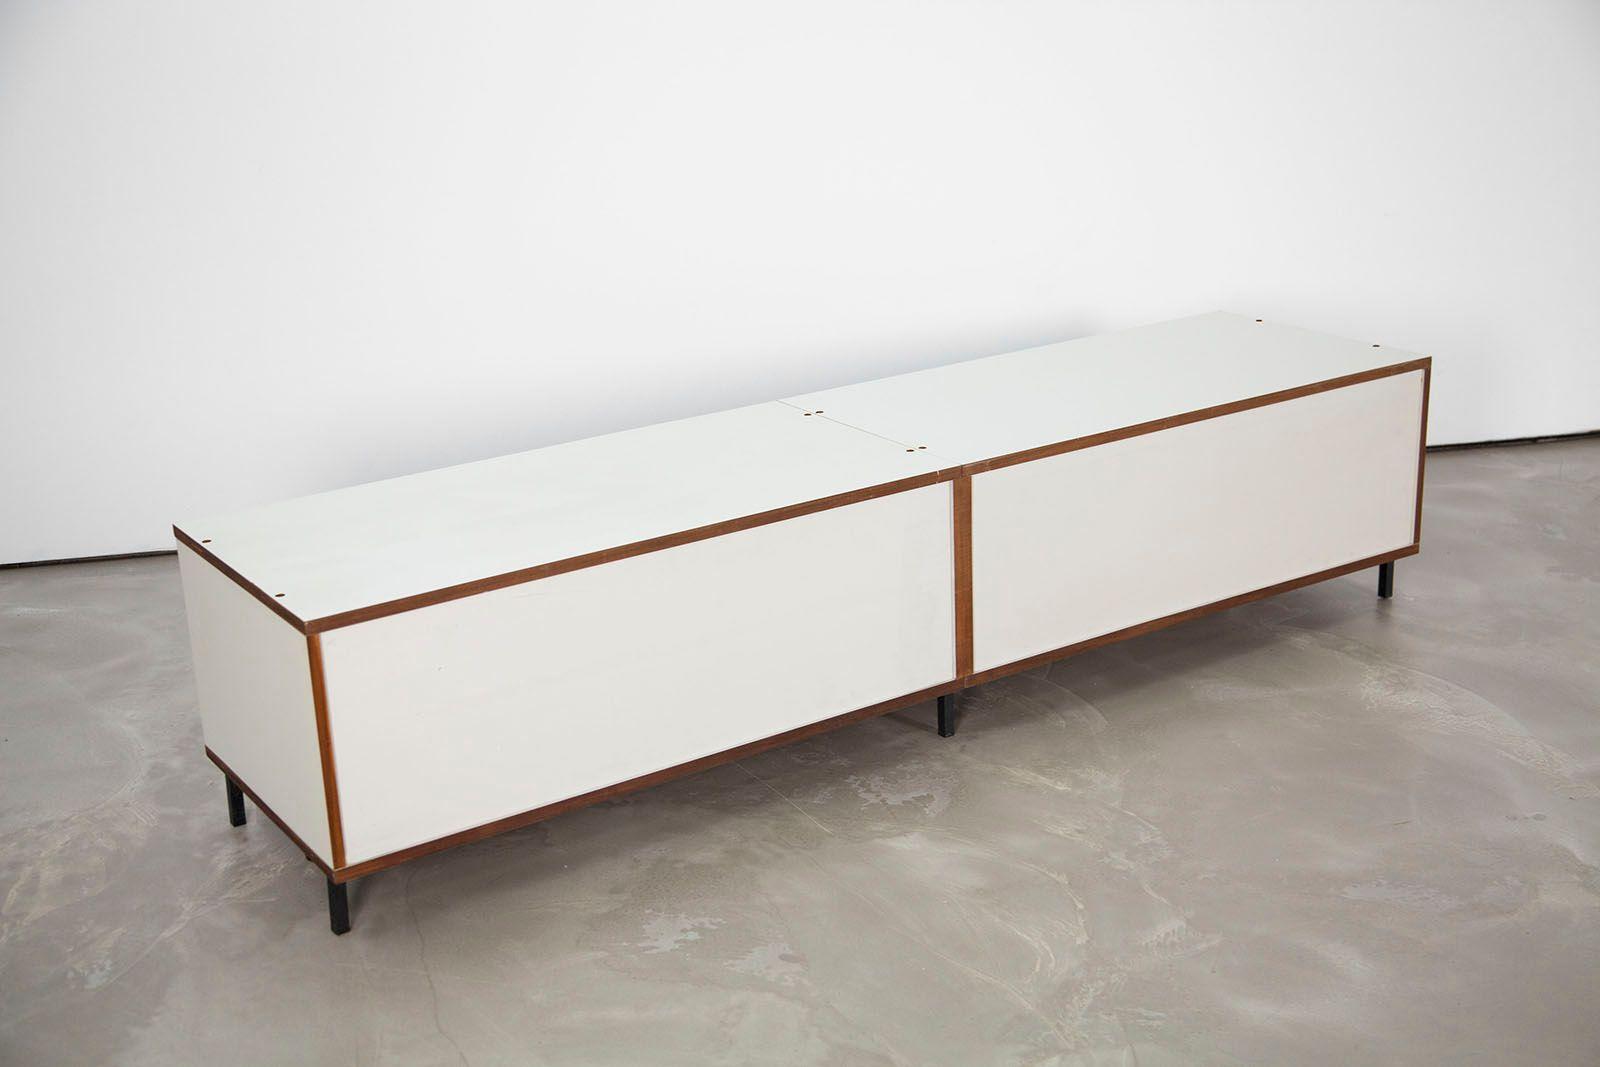 german m 125 formica sideboard with sliding doors by hans. Black Bedroom Furniture Sets. Home Design Ideas